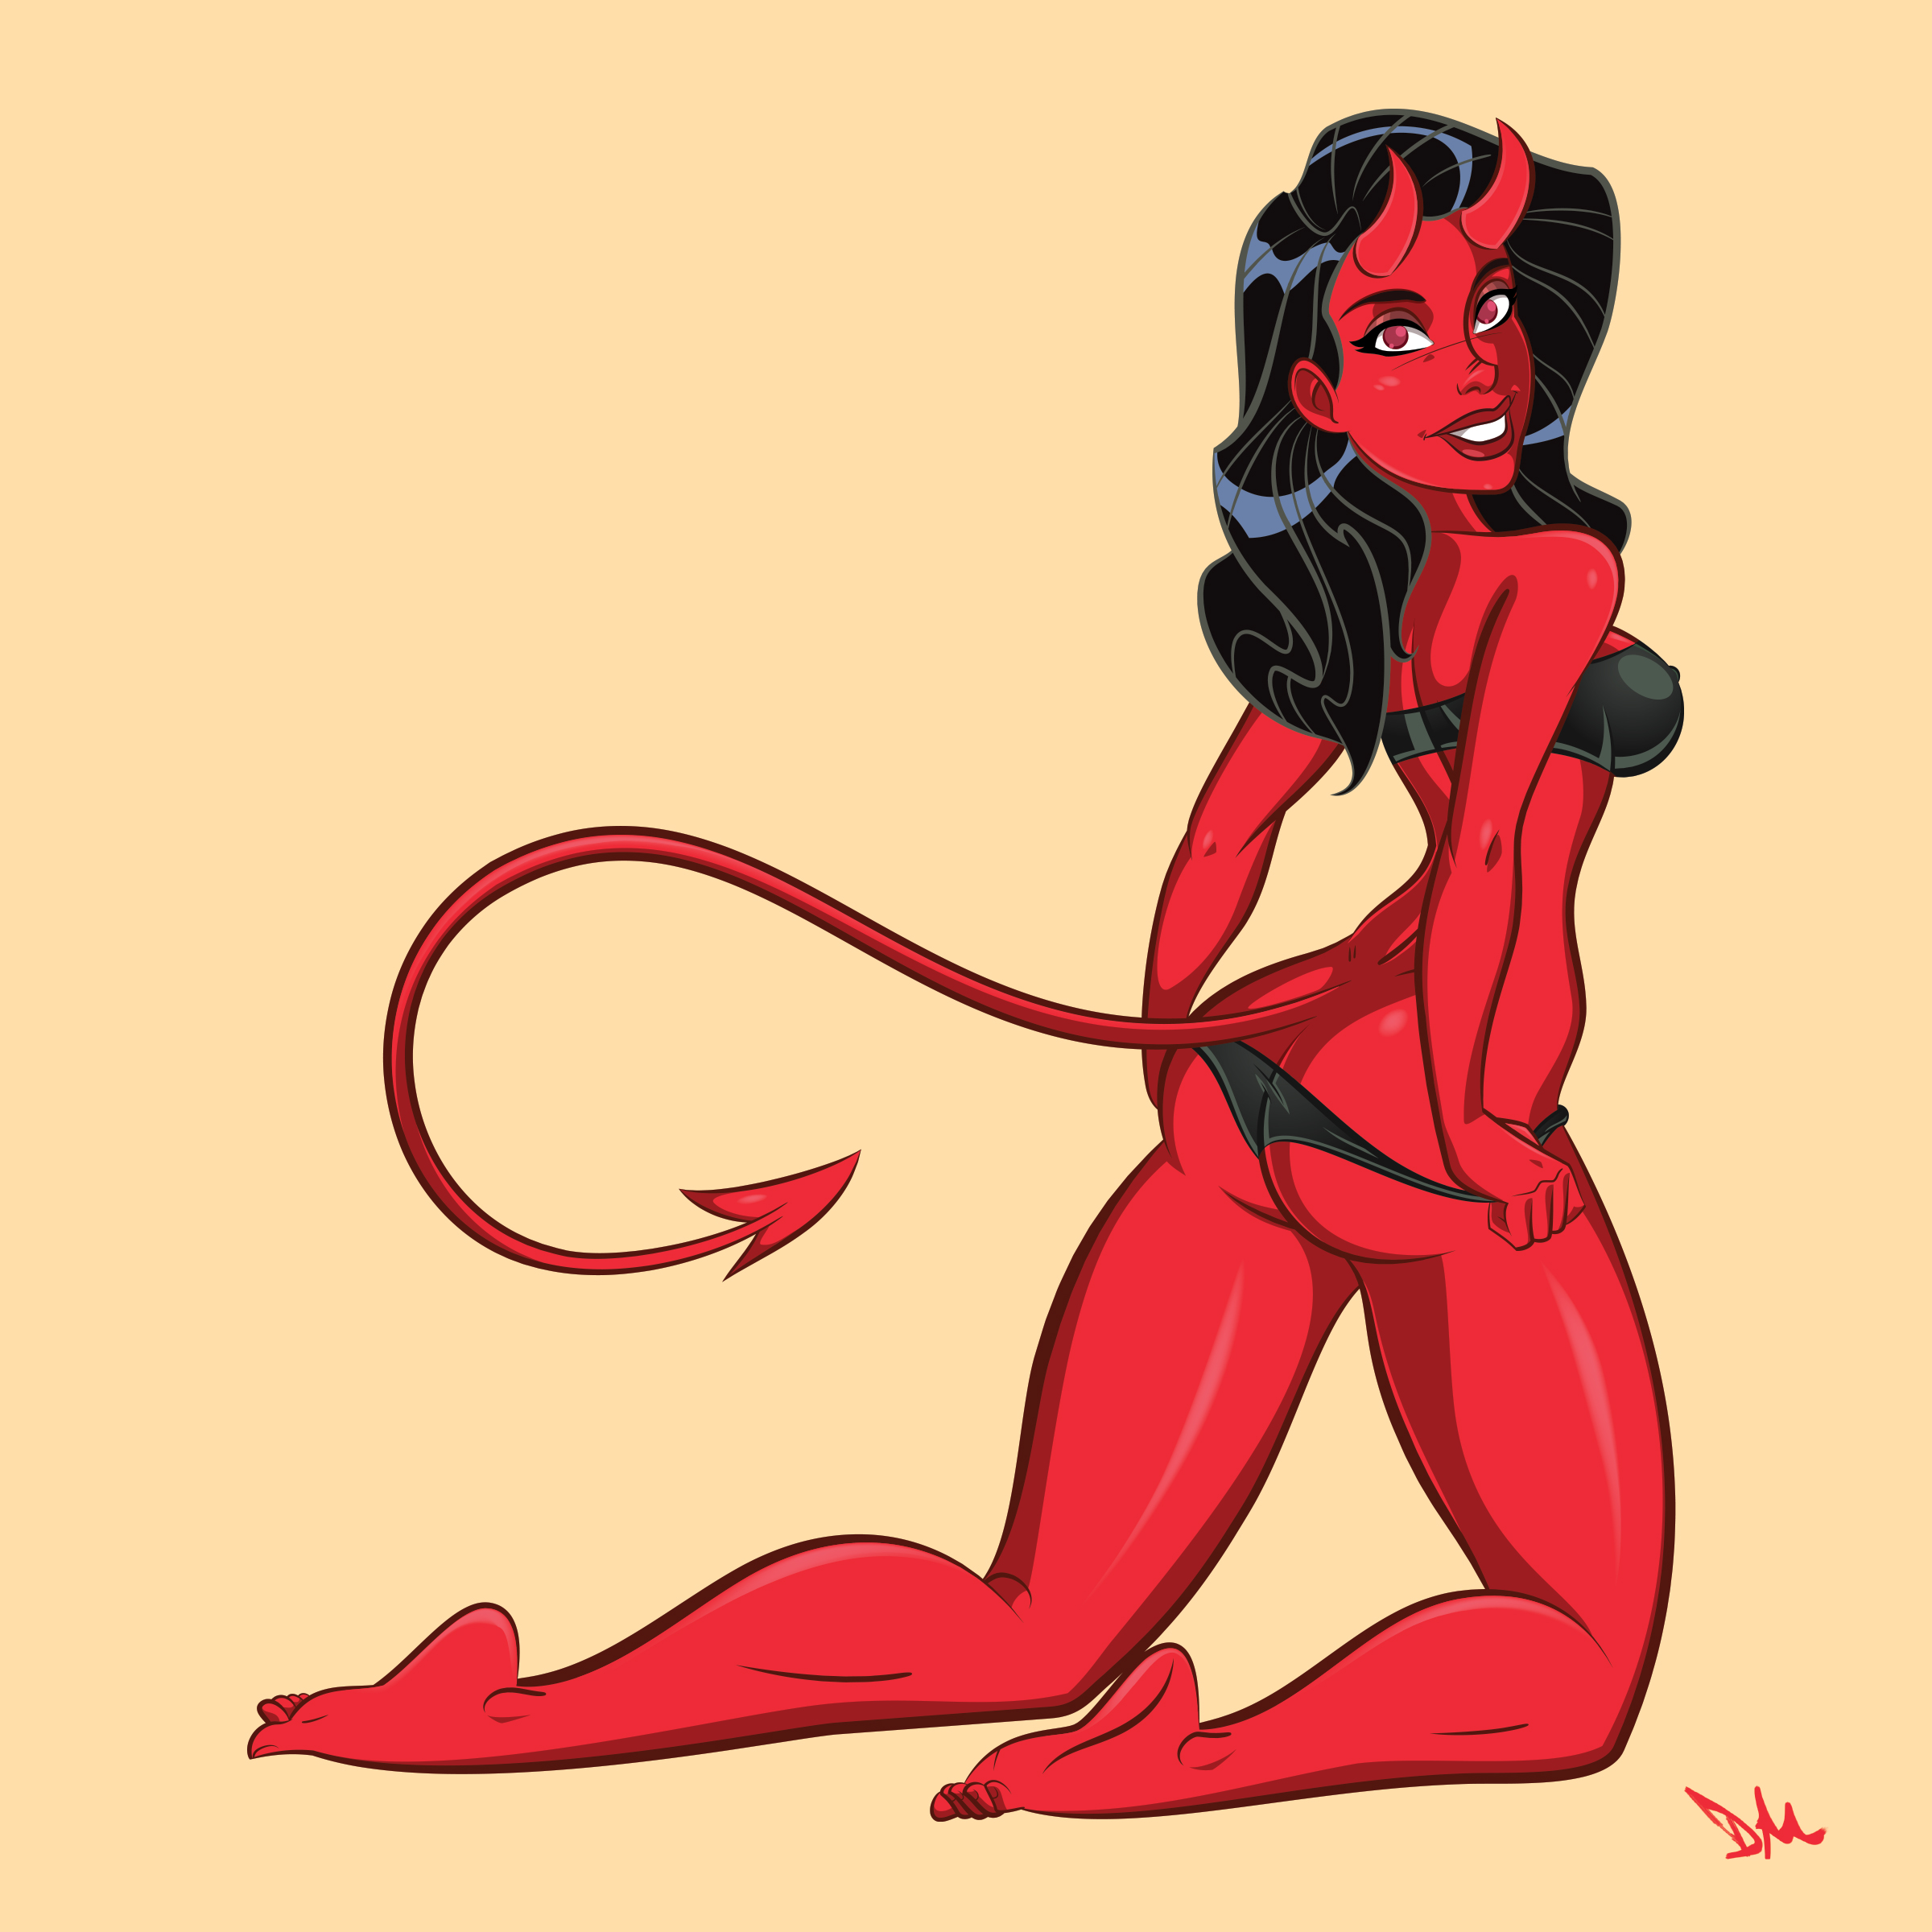 Cindy Devil Pin-up